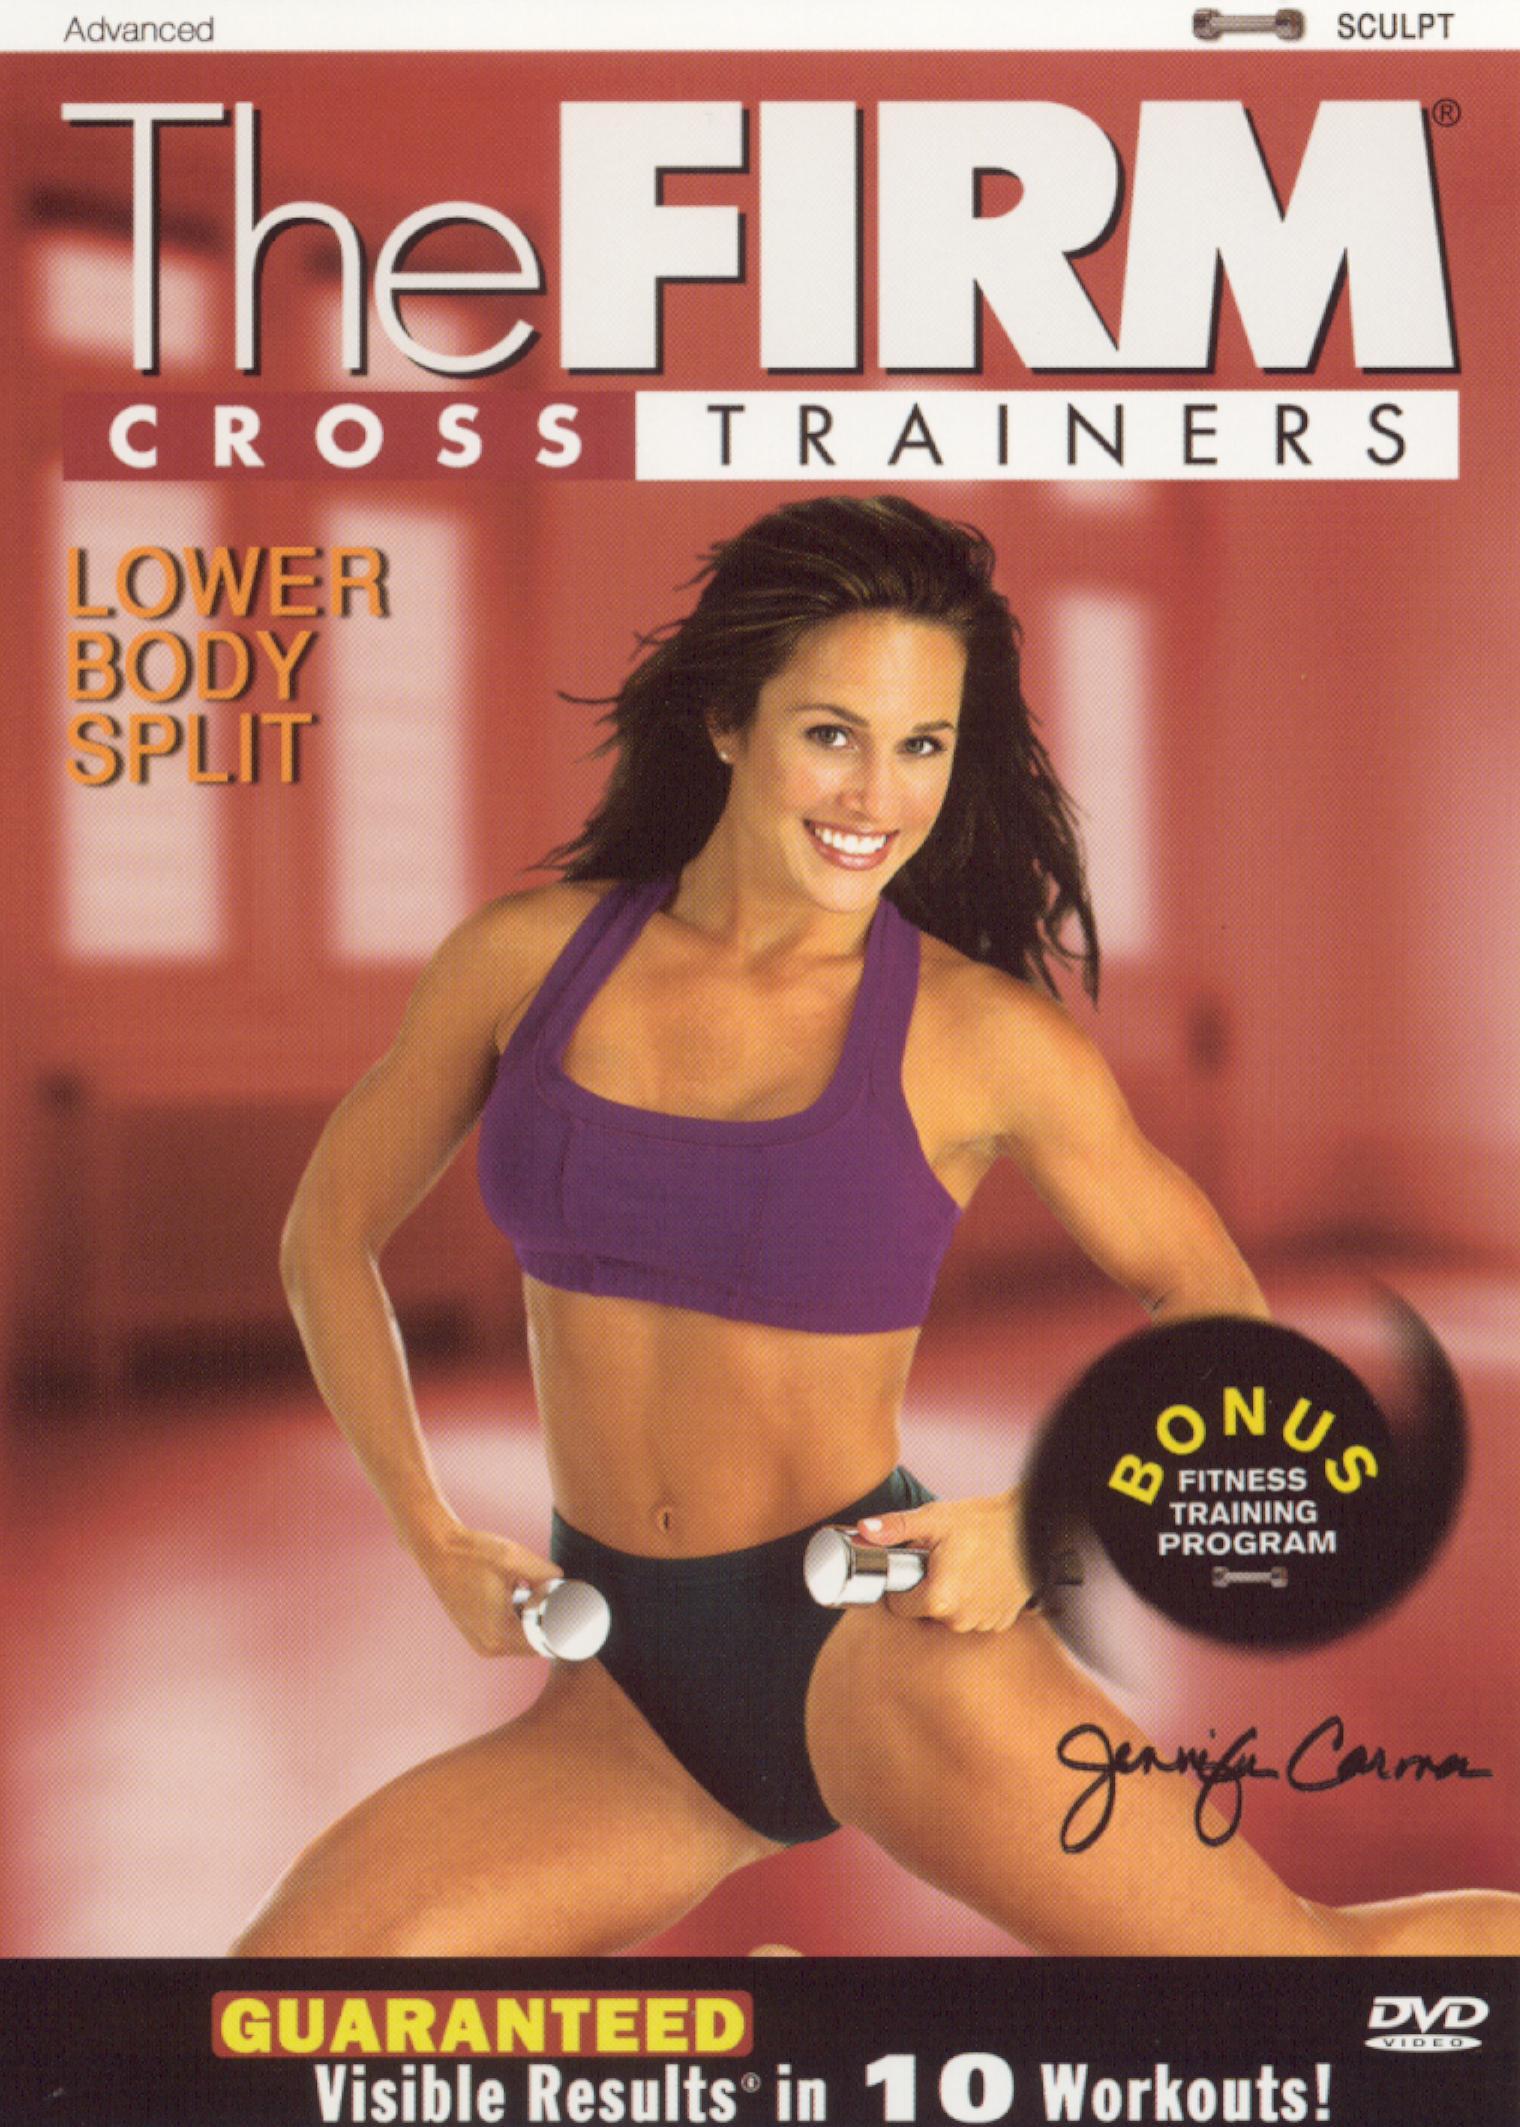 The Firm: Cross Trainers - Lower Body Split